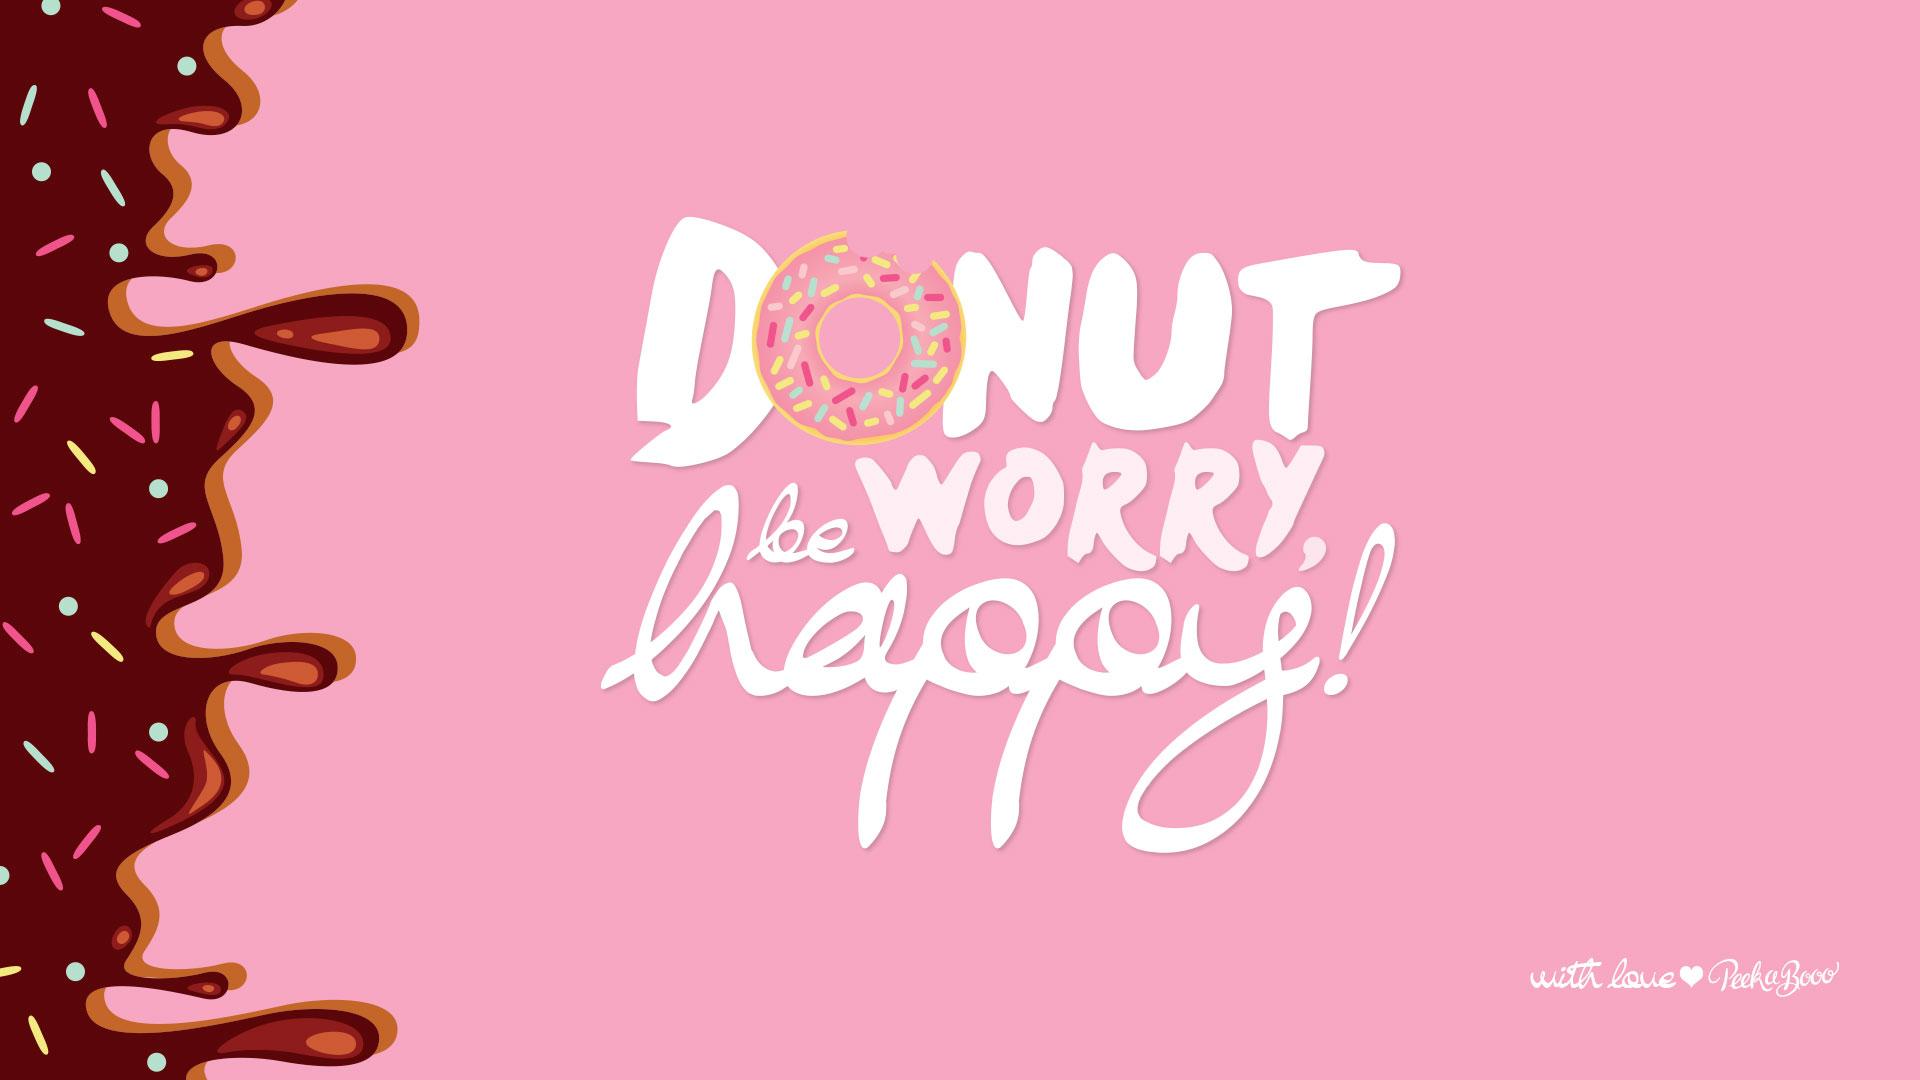 nouveau fond d 39 cran donut worry be happy peek a booo. Black Bedroom Furniture Sets. Home Design Ideas